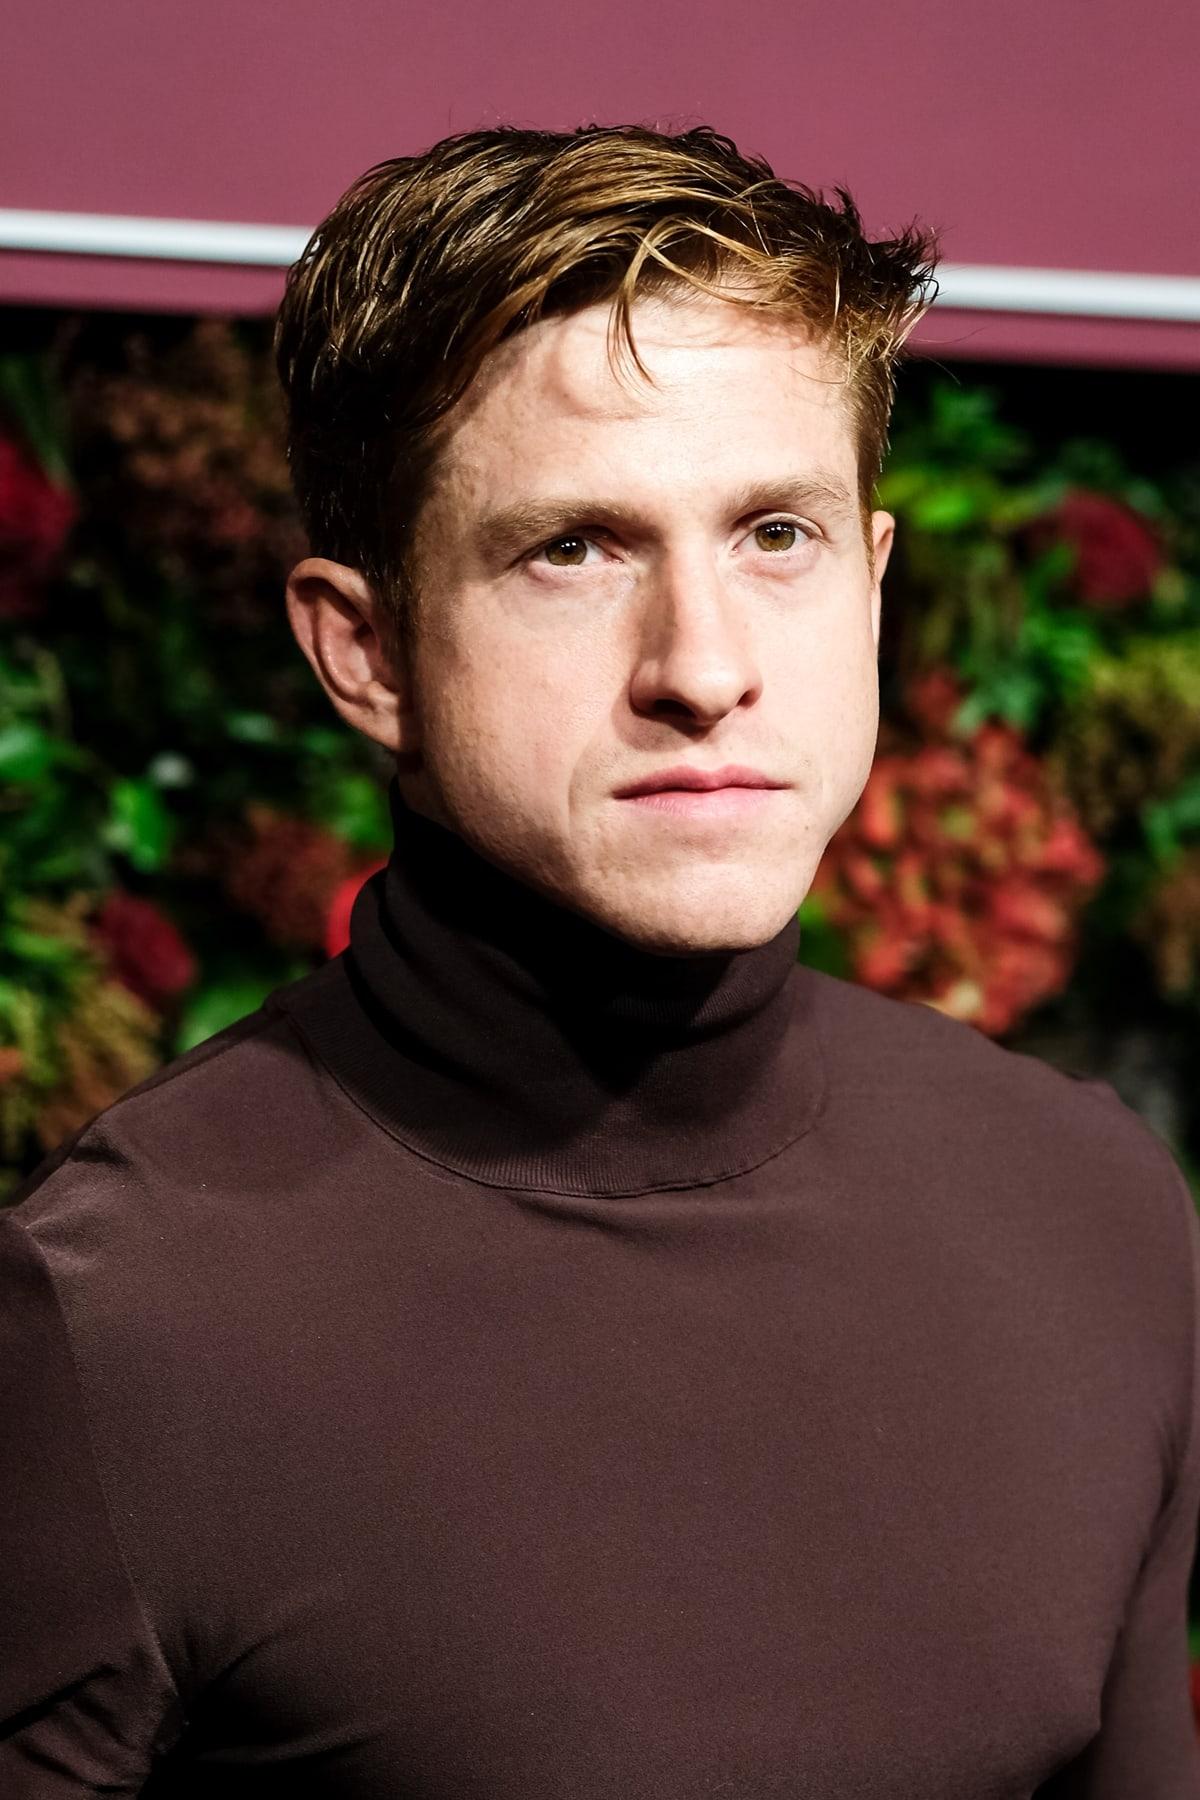 Creative director of Bottega Veneta Daniel Lee attends 65th Evening Standard Theatre Awards